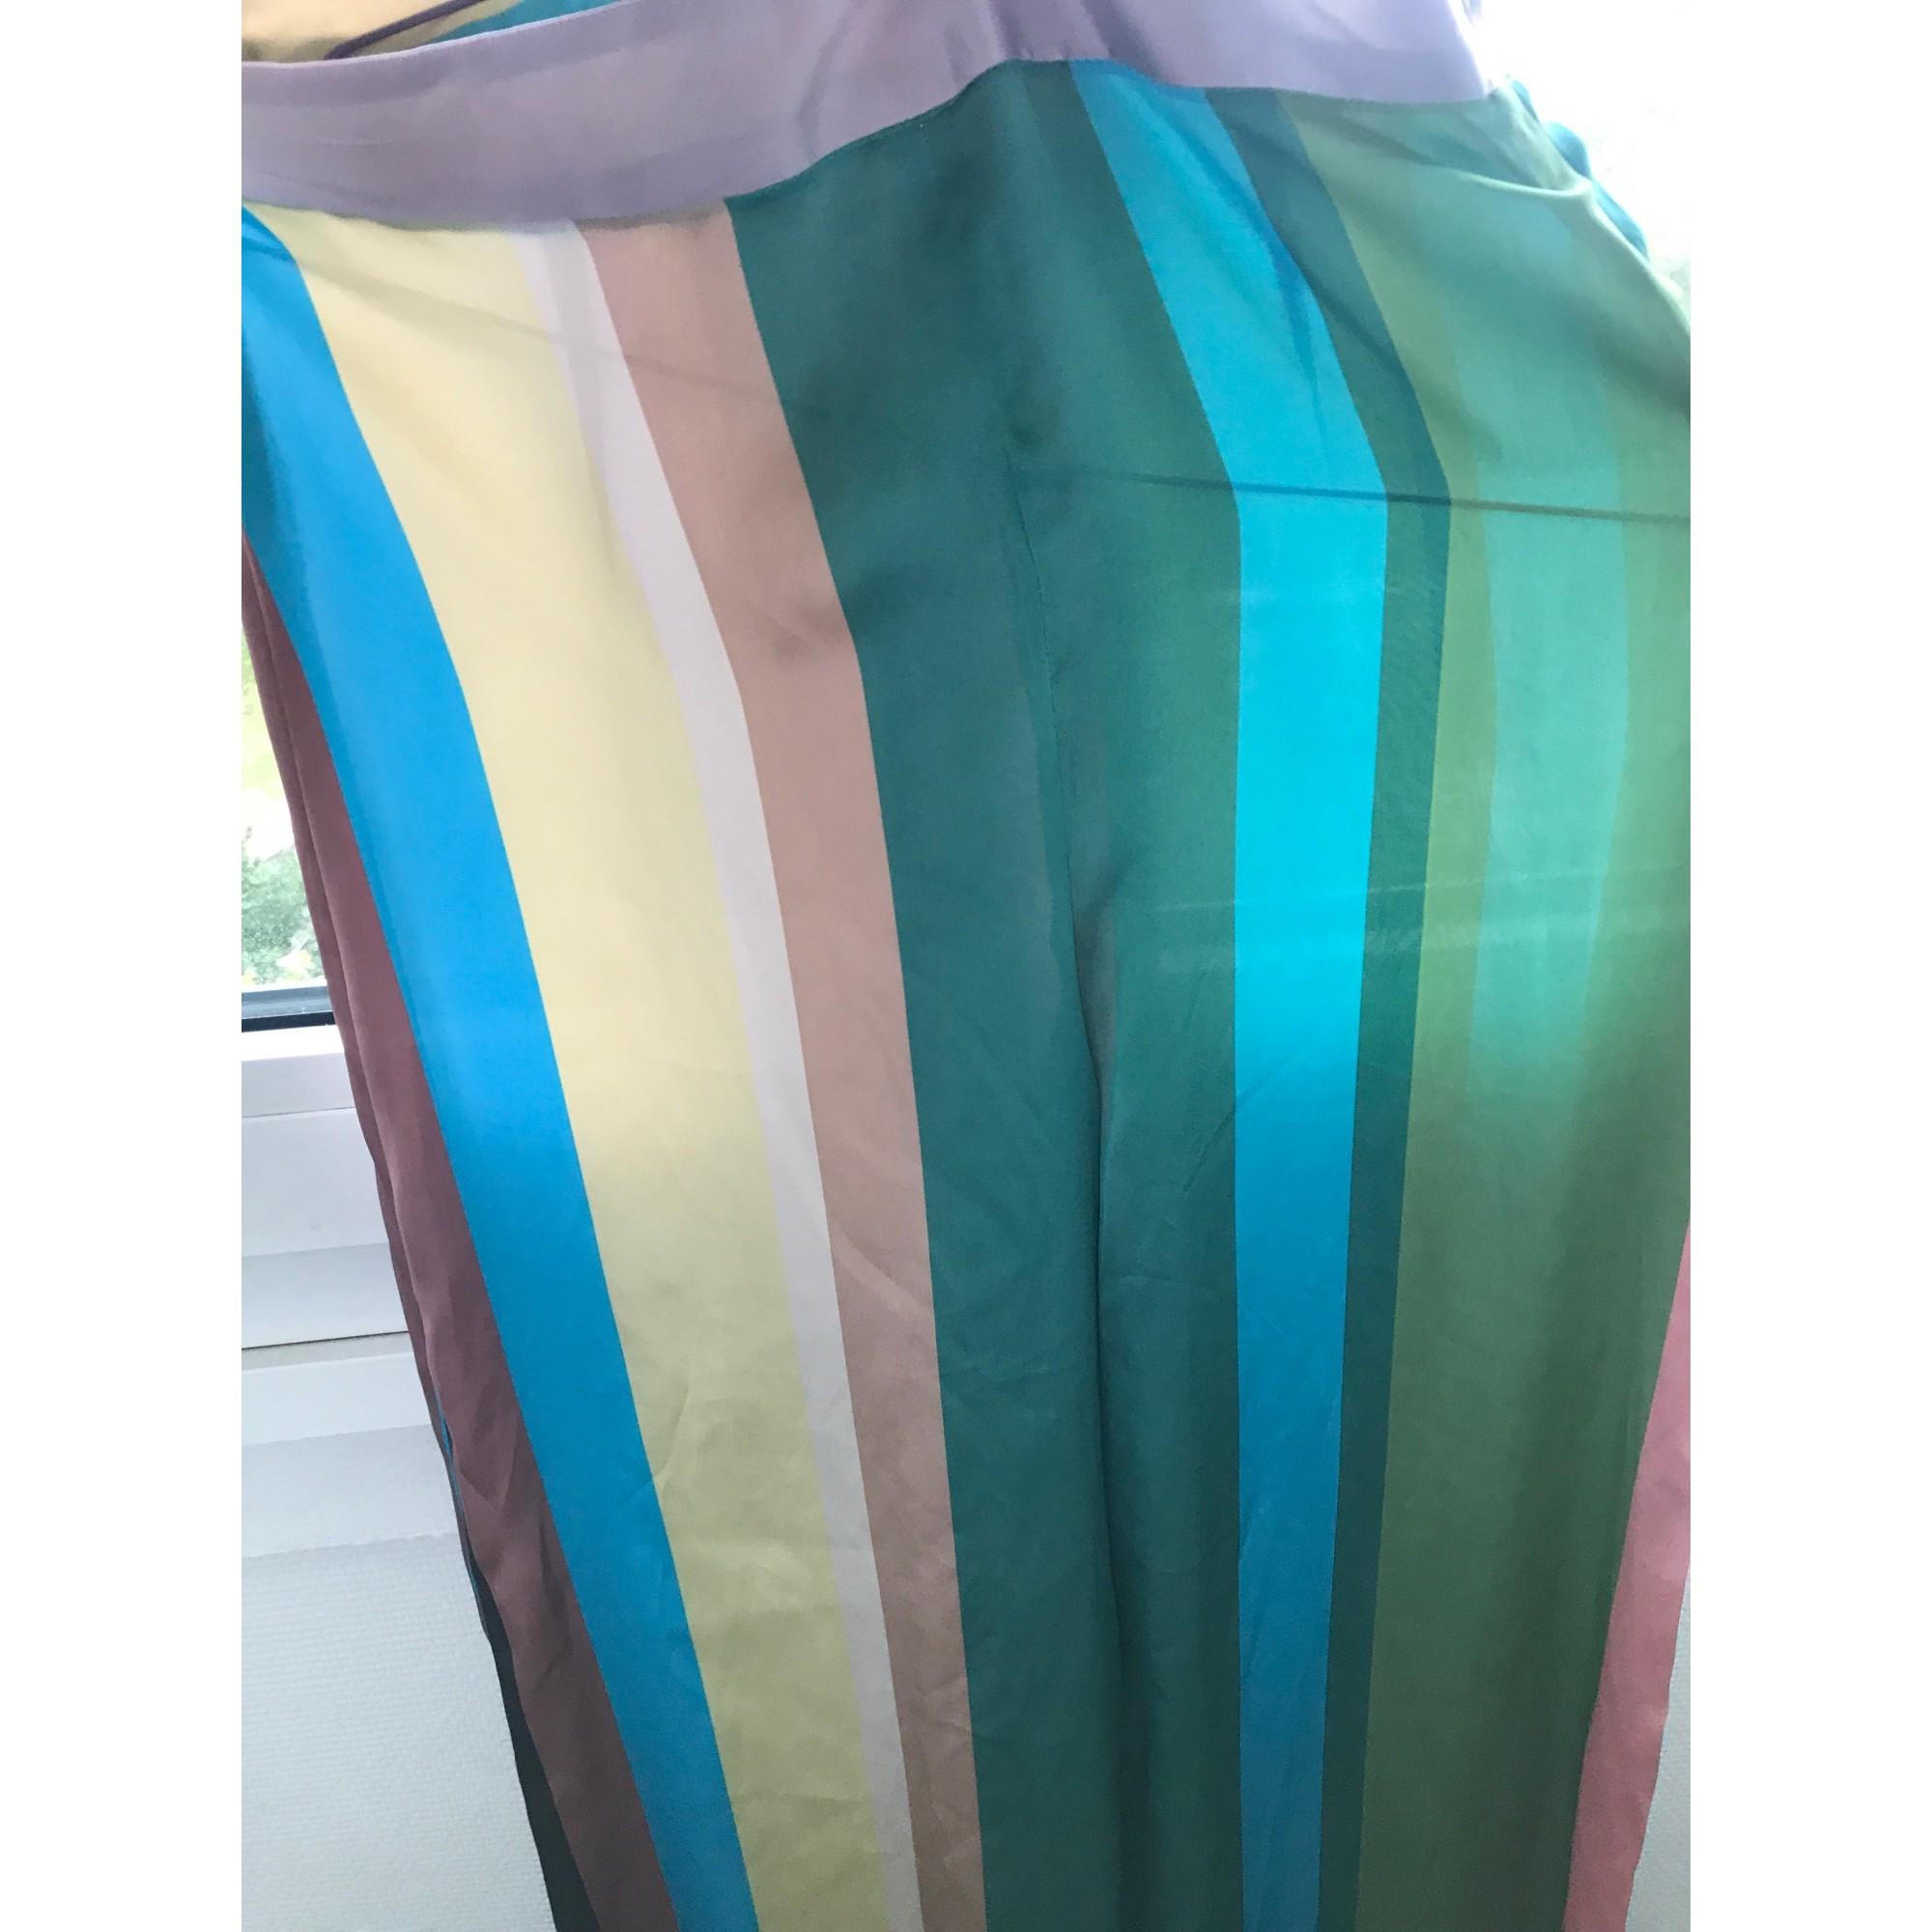 Pantalon large ZARA Bleu vert jaune marron